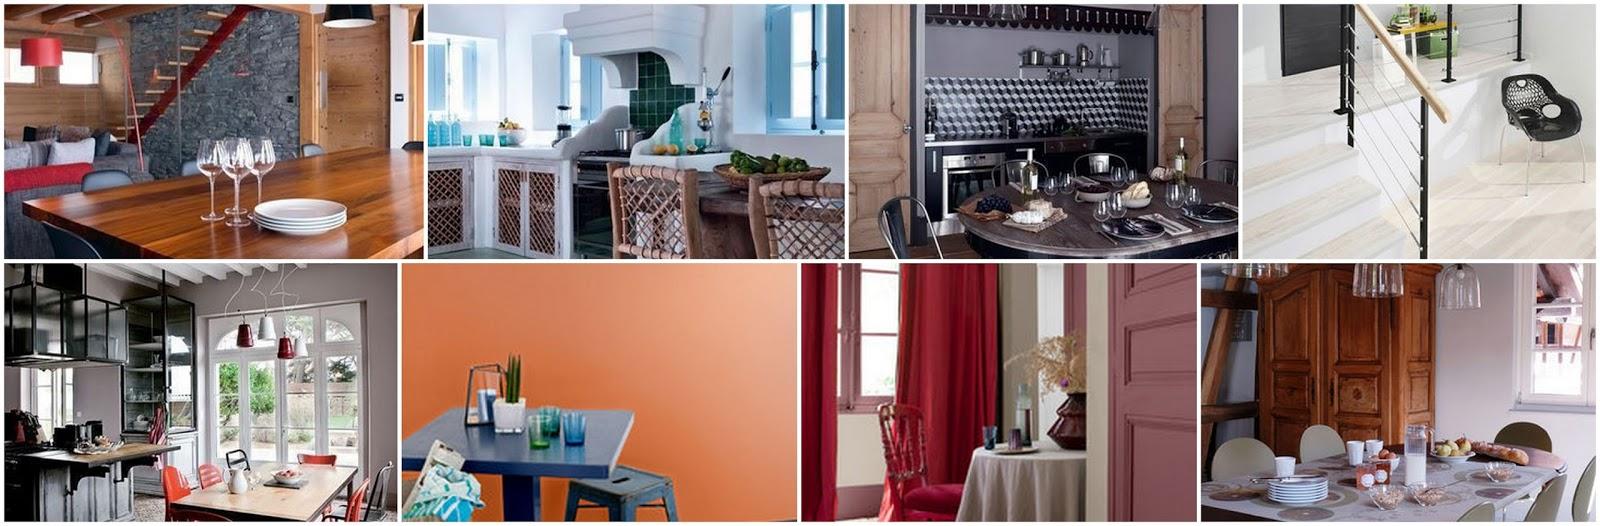 devis peinture maison neuve renov ex. Black Bedroom Furniture Sets. Home Design Ideas